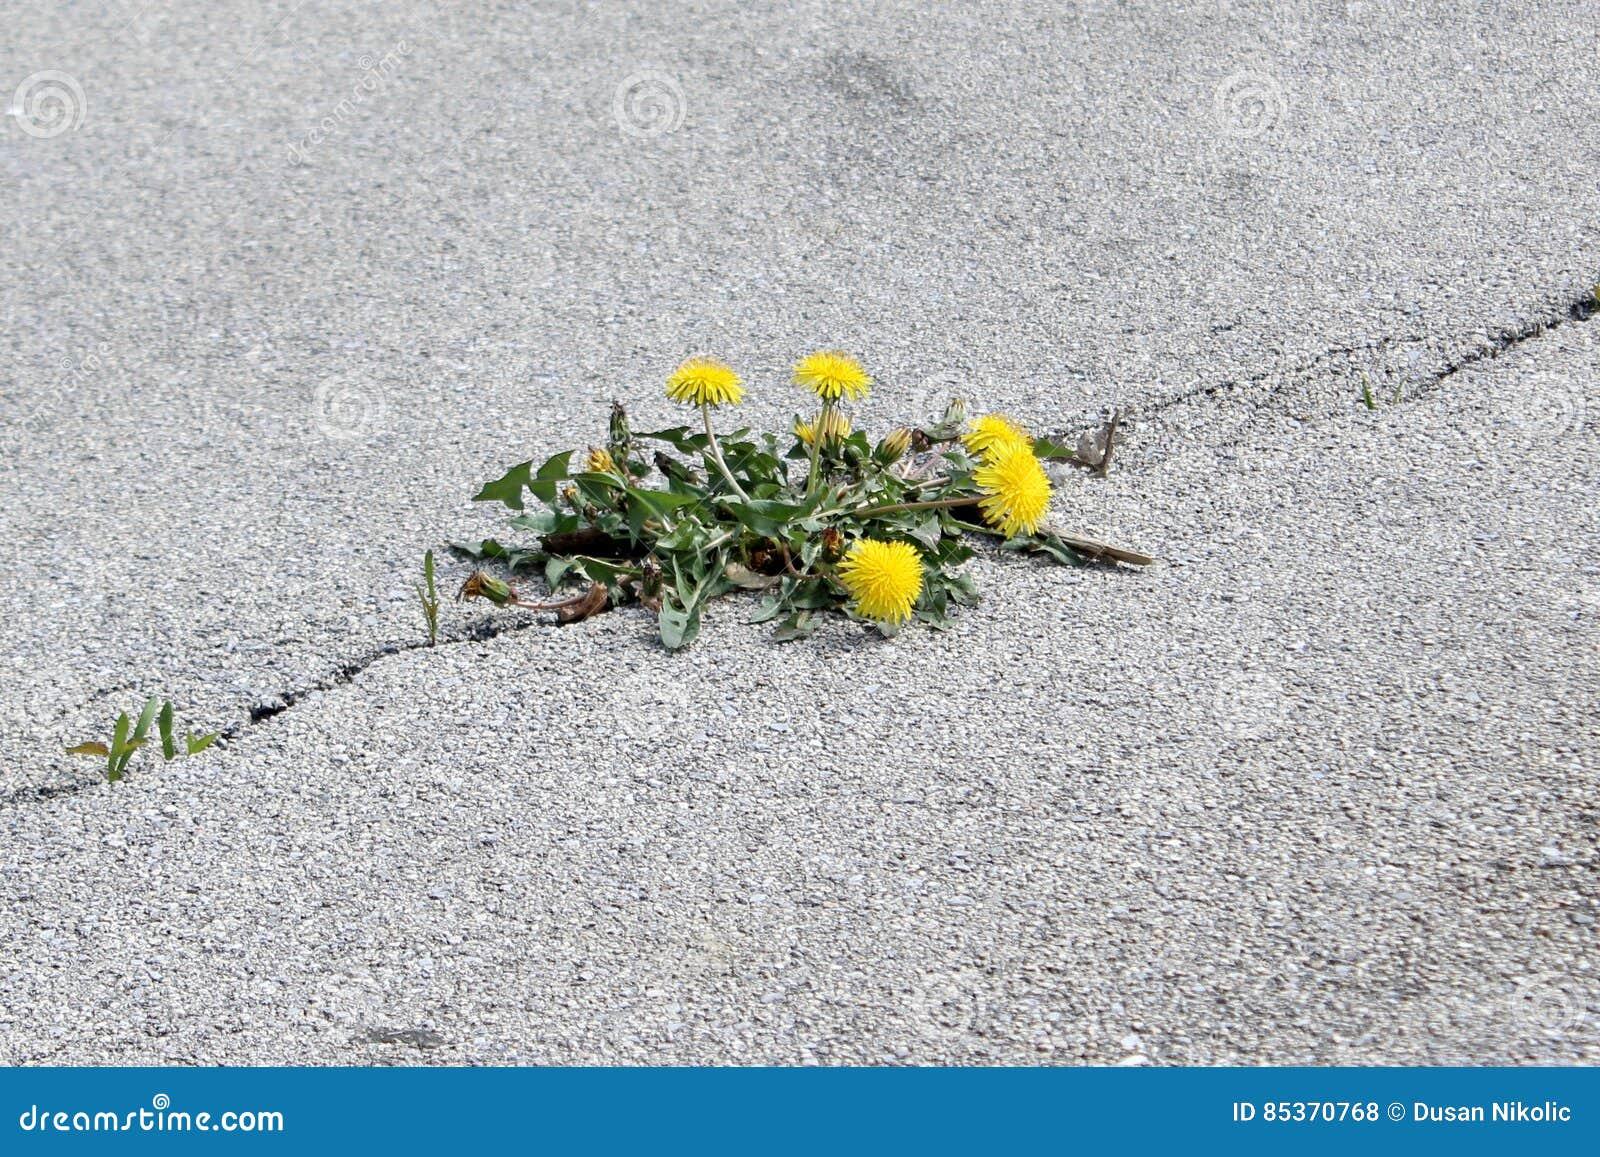 Flor en grieta del asfalto